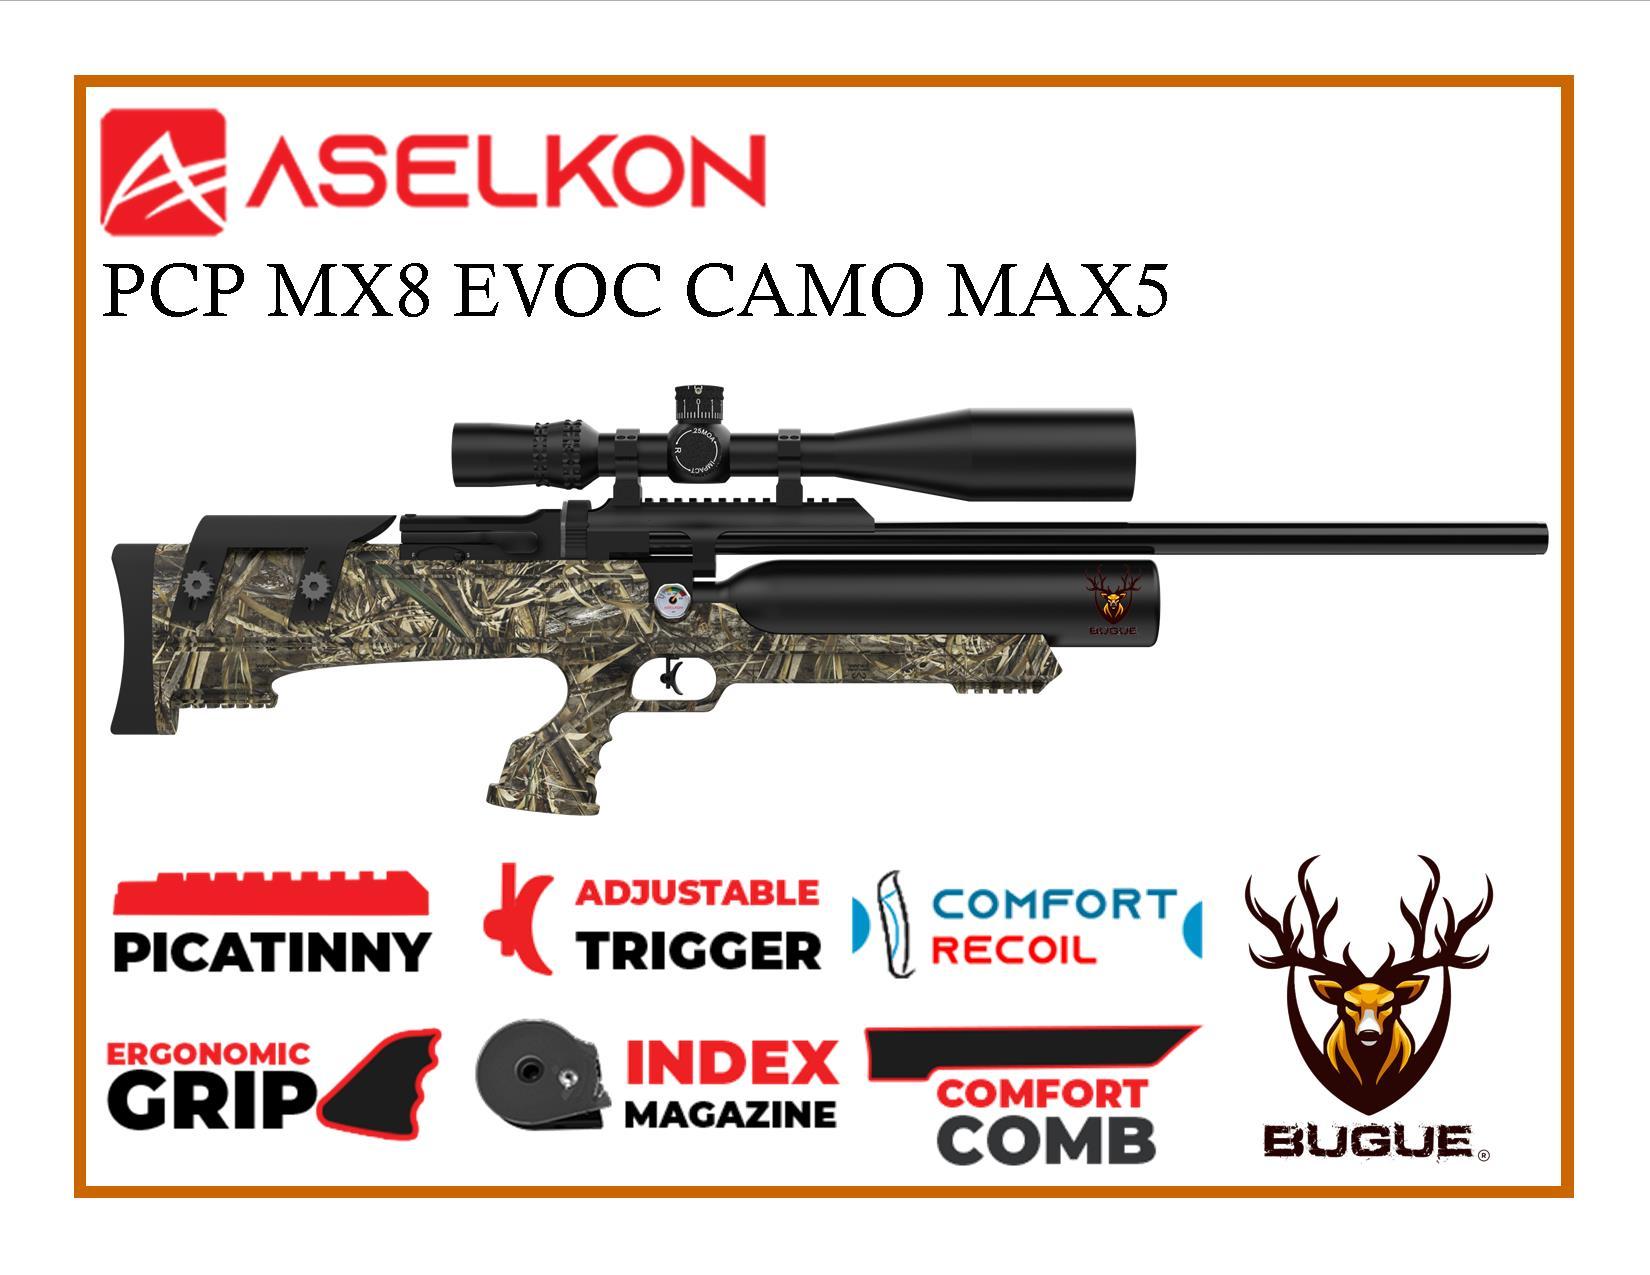 RIFLE PCP ASELKON MX8 EVOC CAMO MAX 5.5 MM